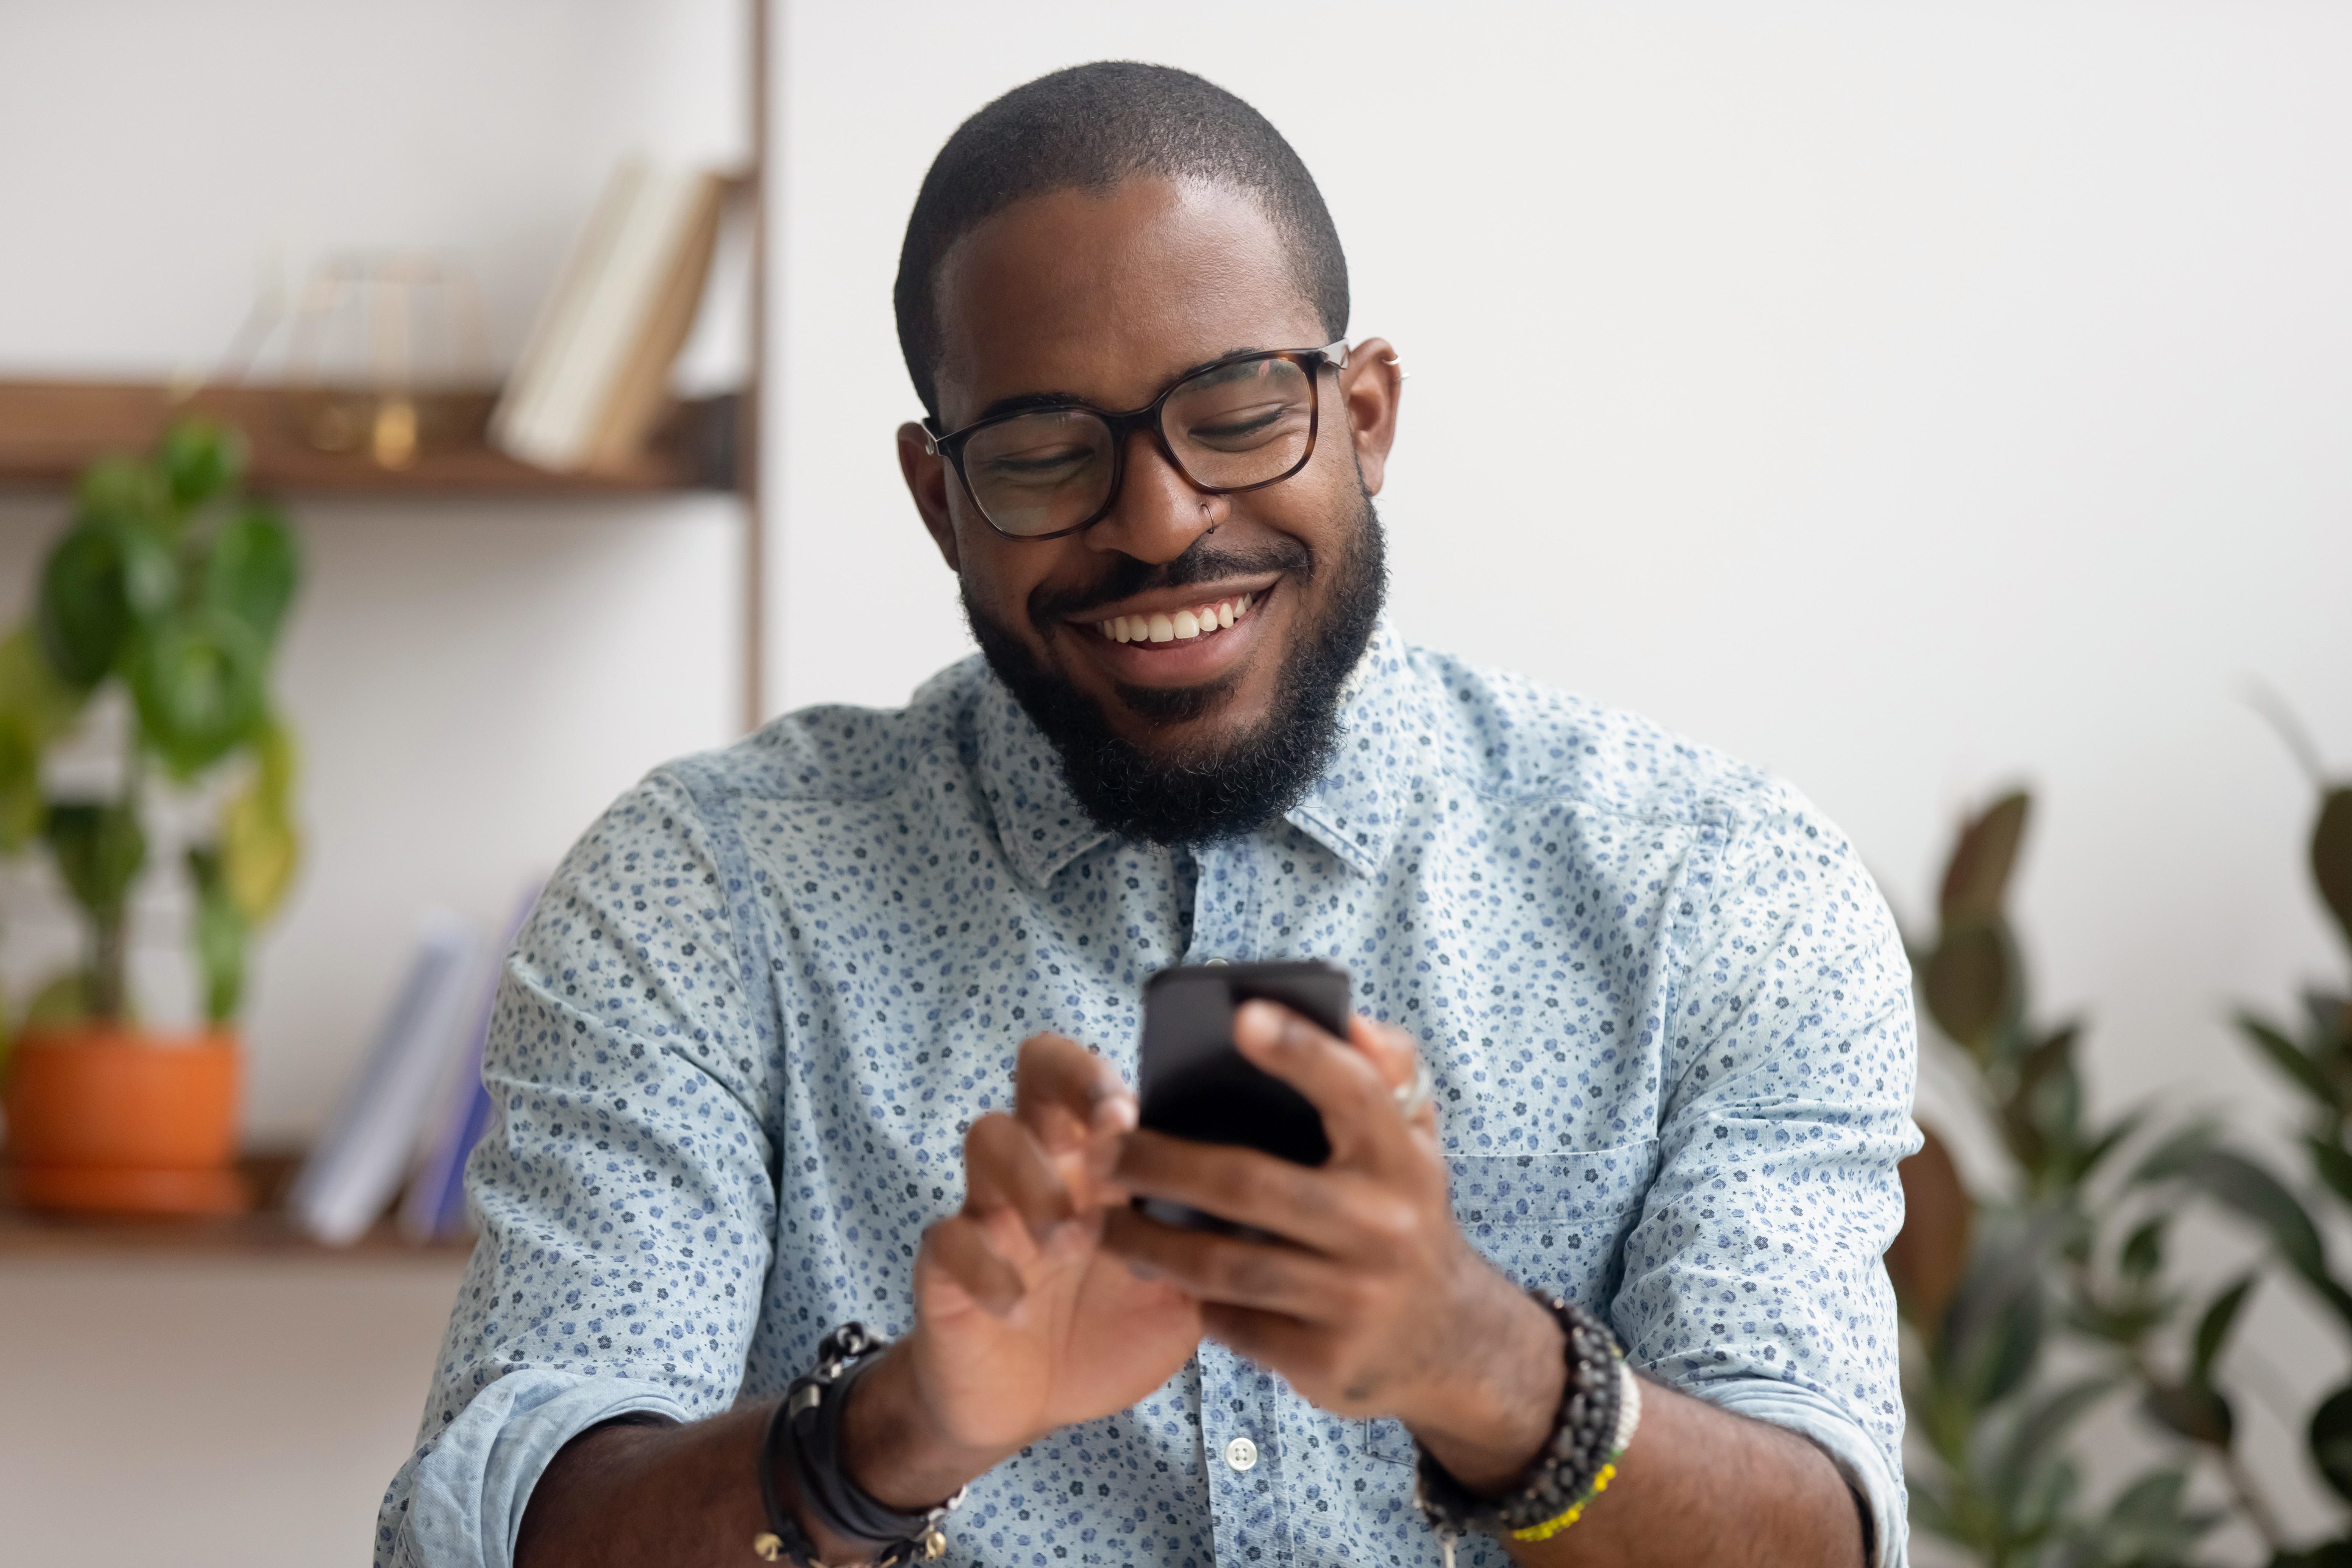 Man smiling at smartphone